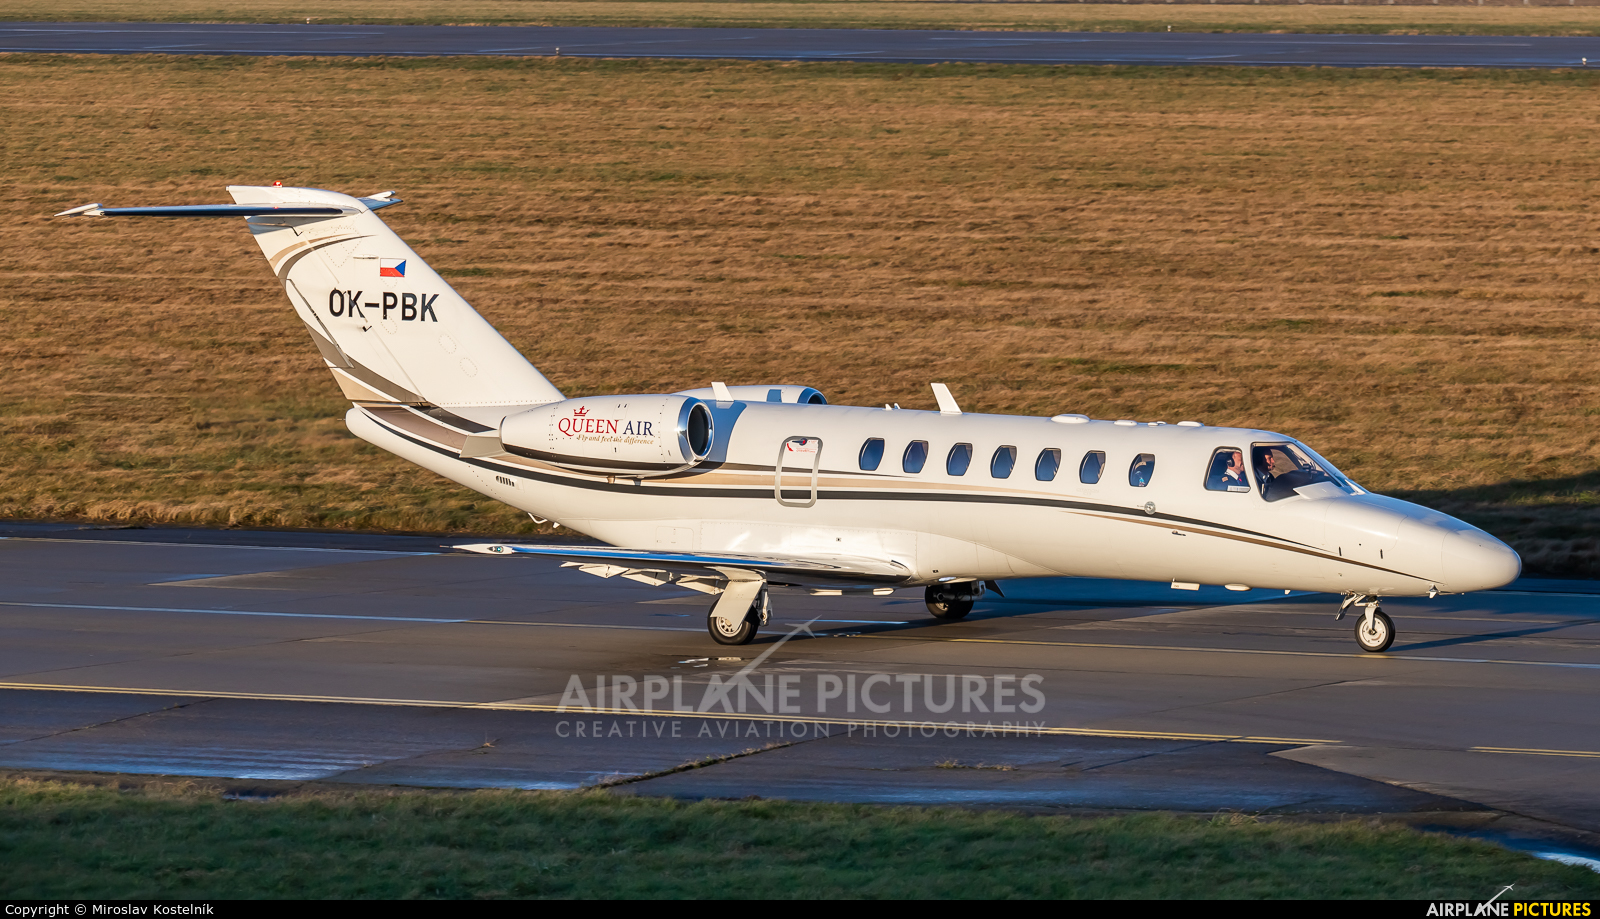 Queen Air OK-PBK aircraft at Ostrava Mošnov